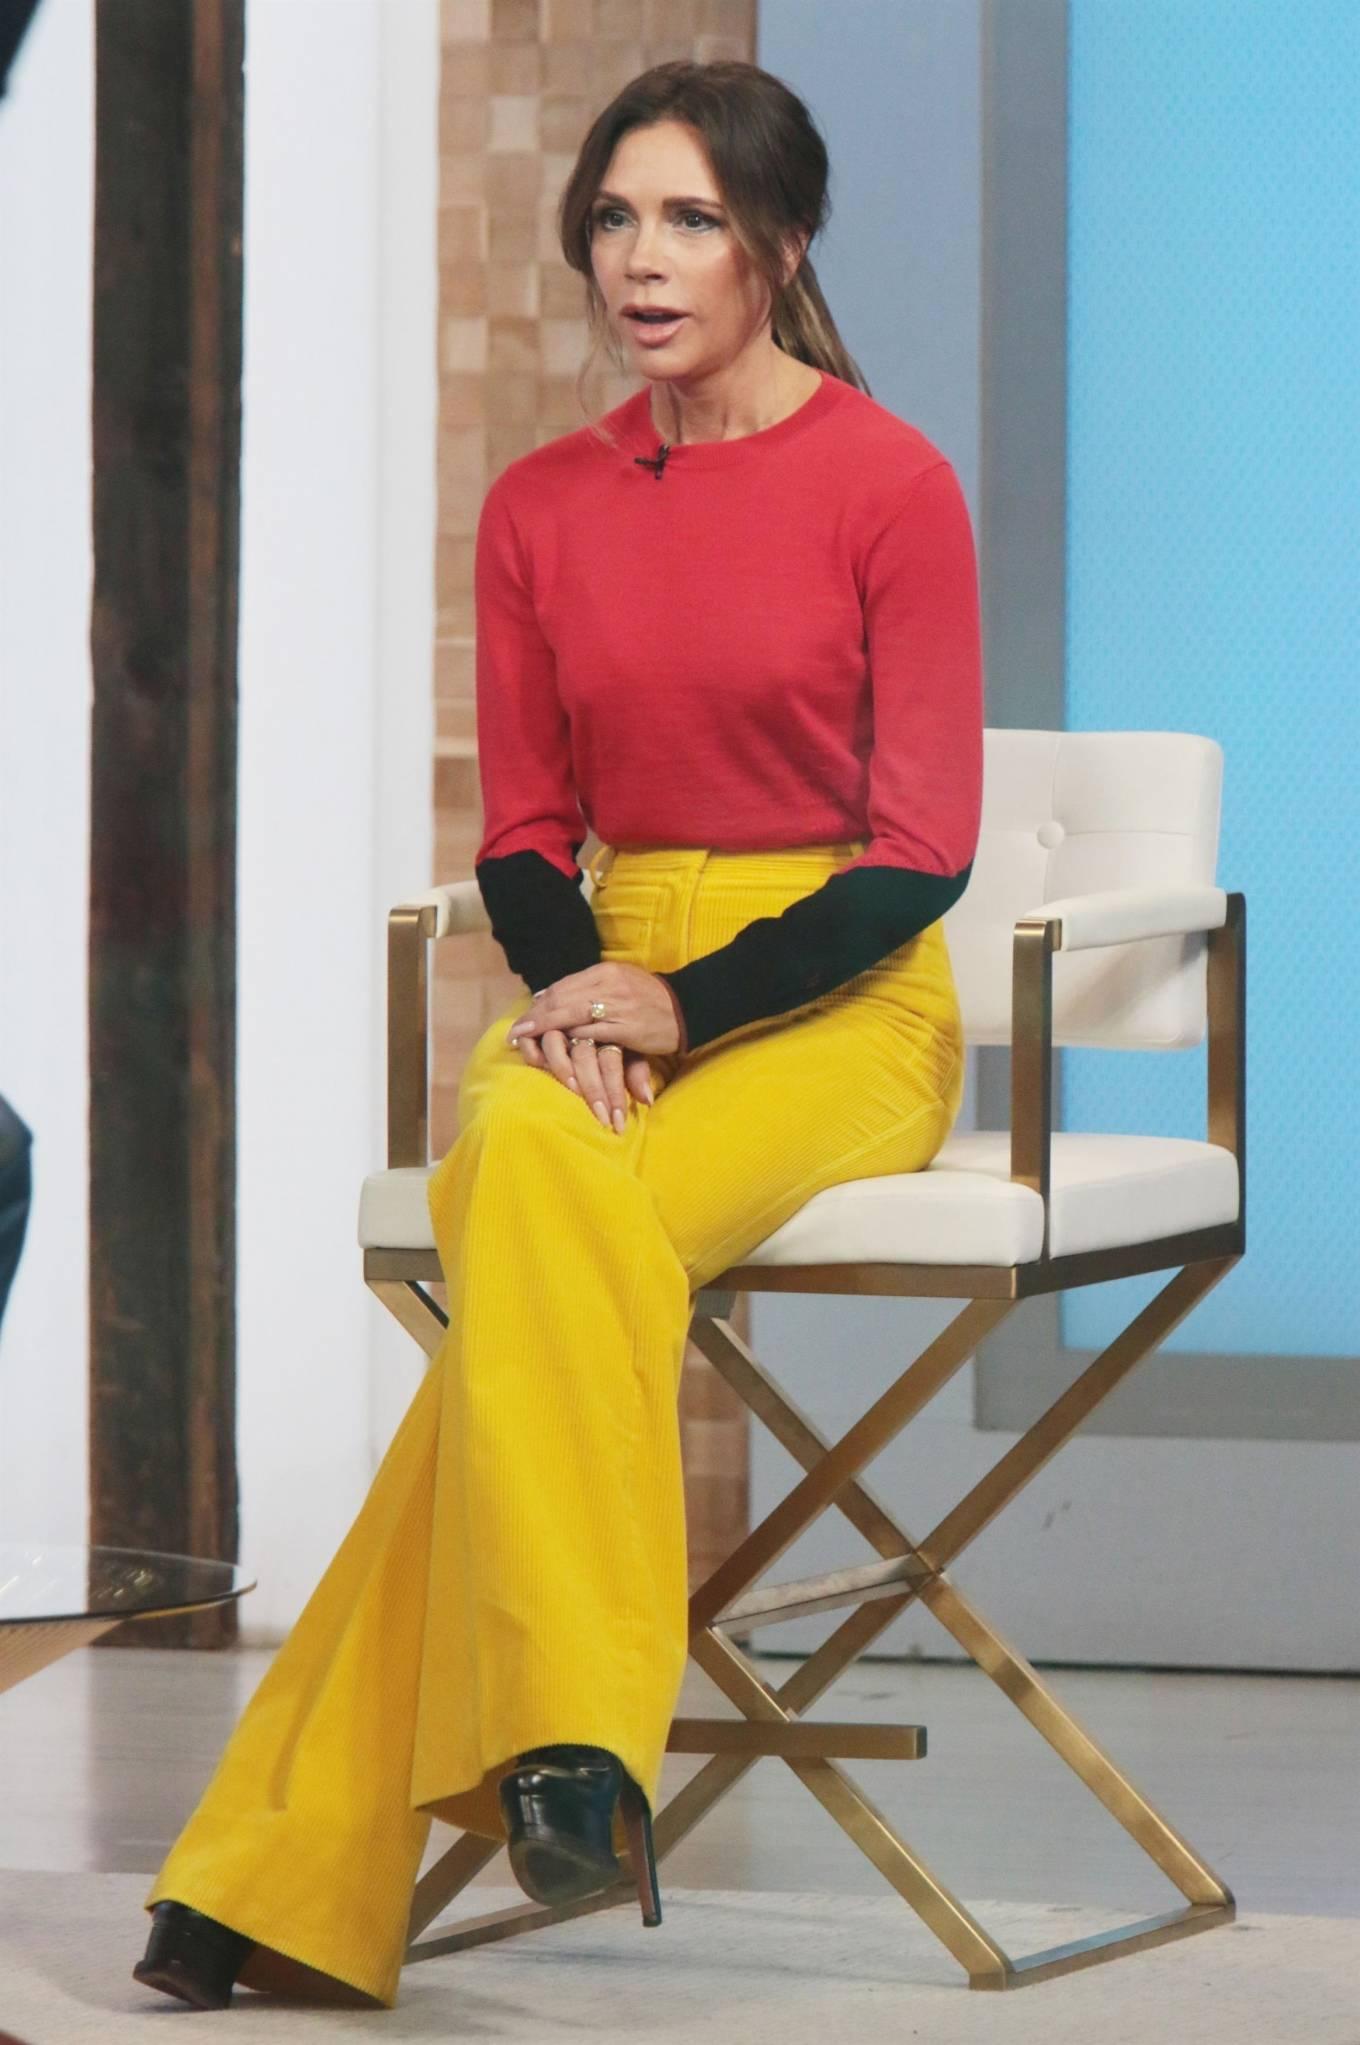 Victoria Beckham 2021 : Victoria Beckham – on Good Morning America promoting her new designer clothing in New York City-44